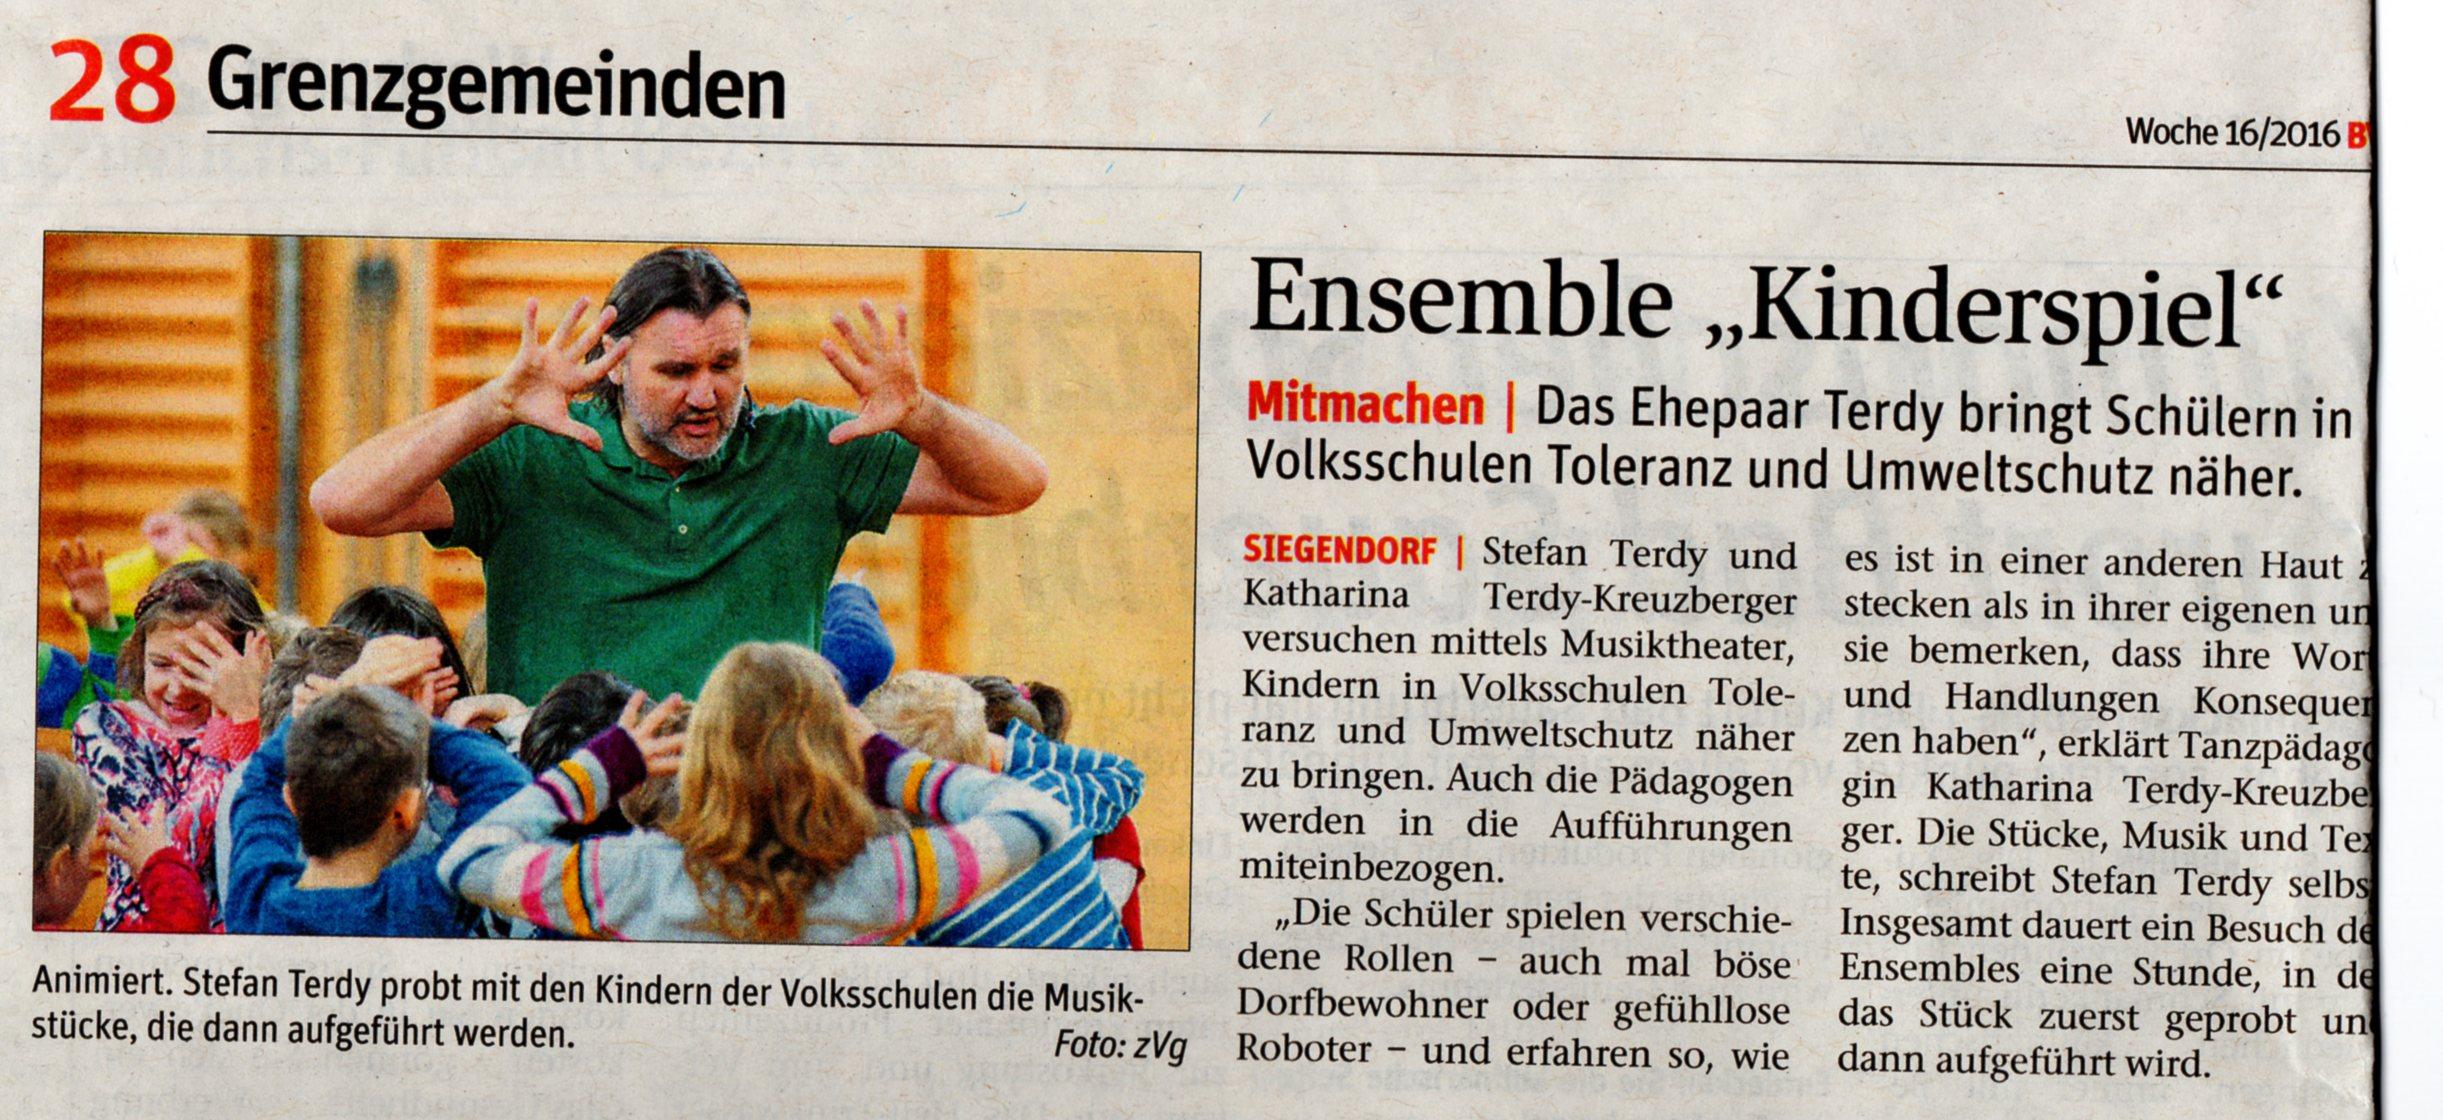 BVZ 16/2016 Artikel KINDERSPIEL